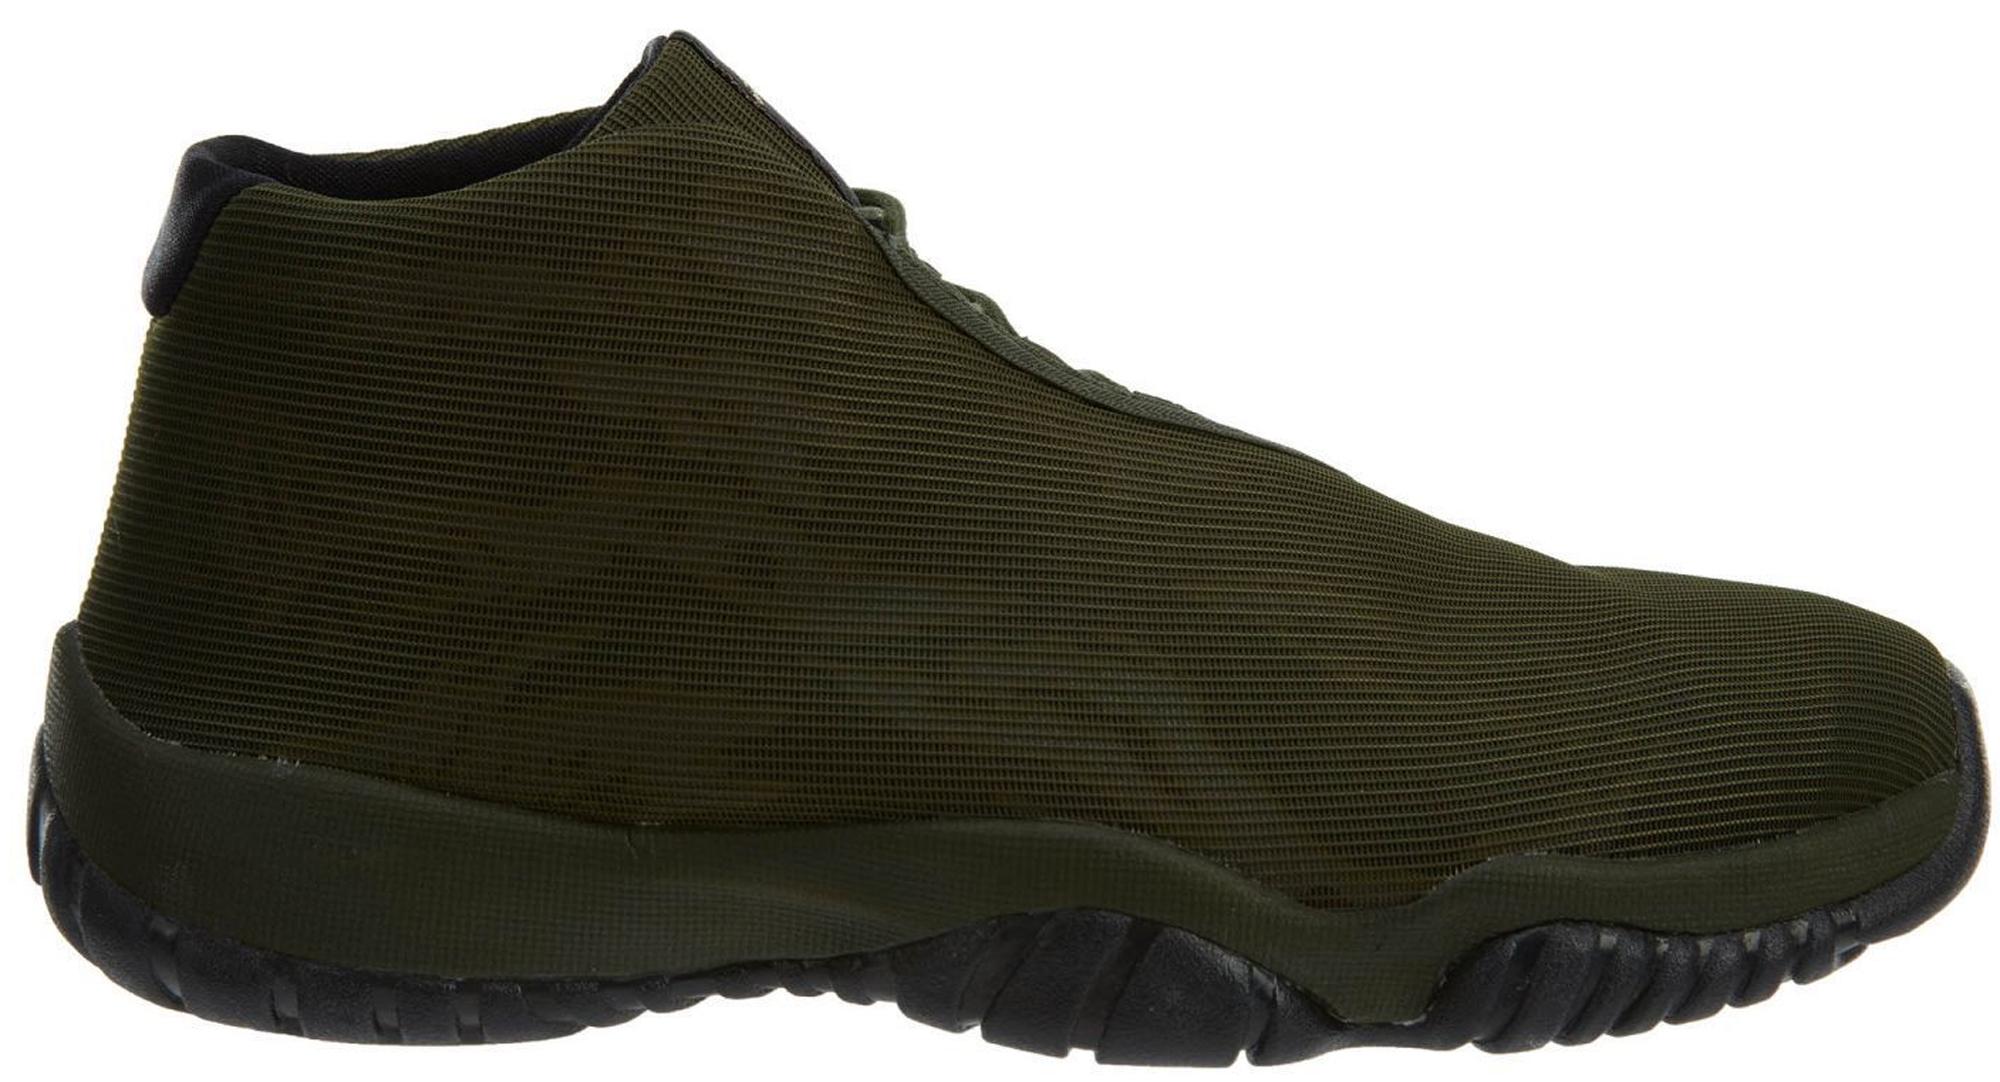 Jordan Future Green Camo - 656503-301